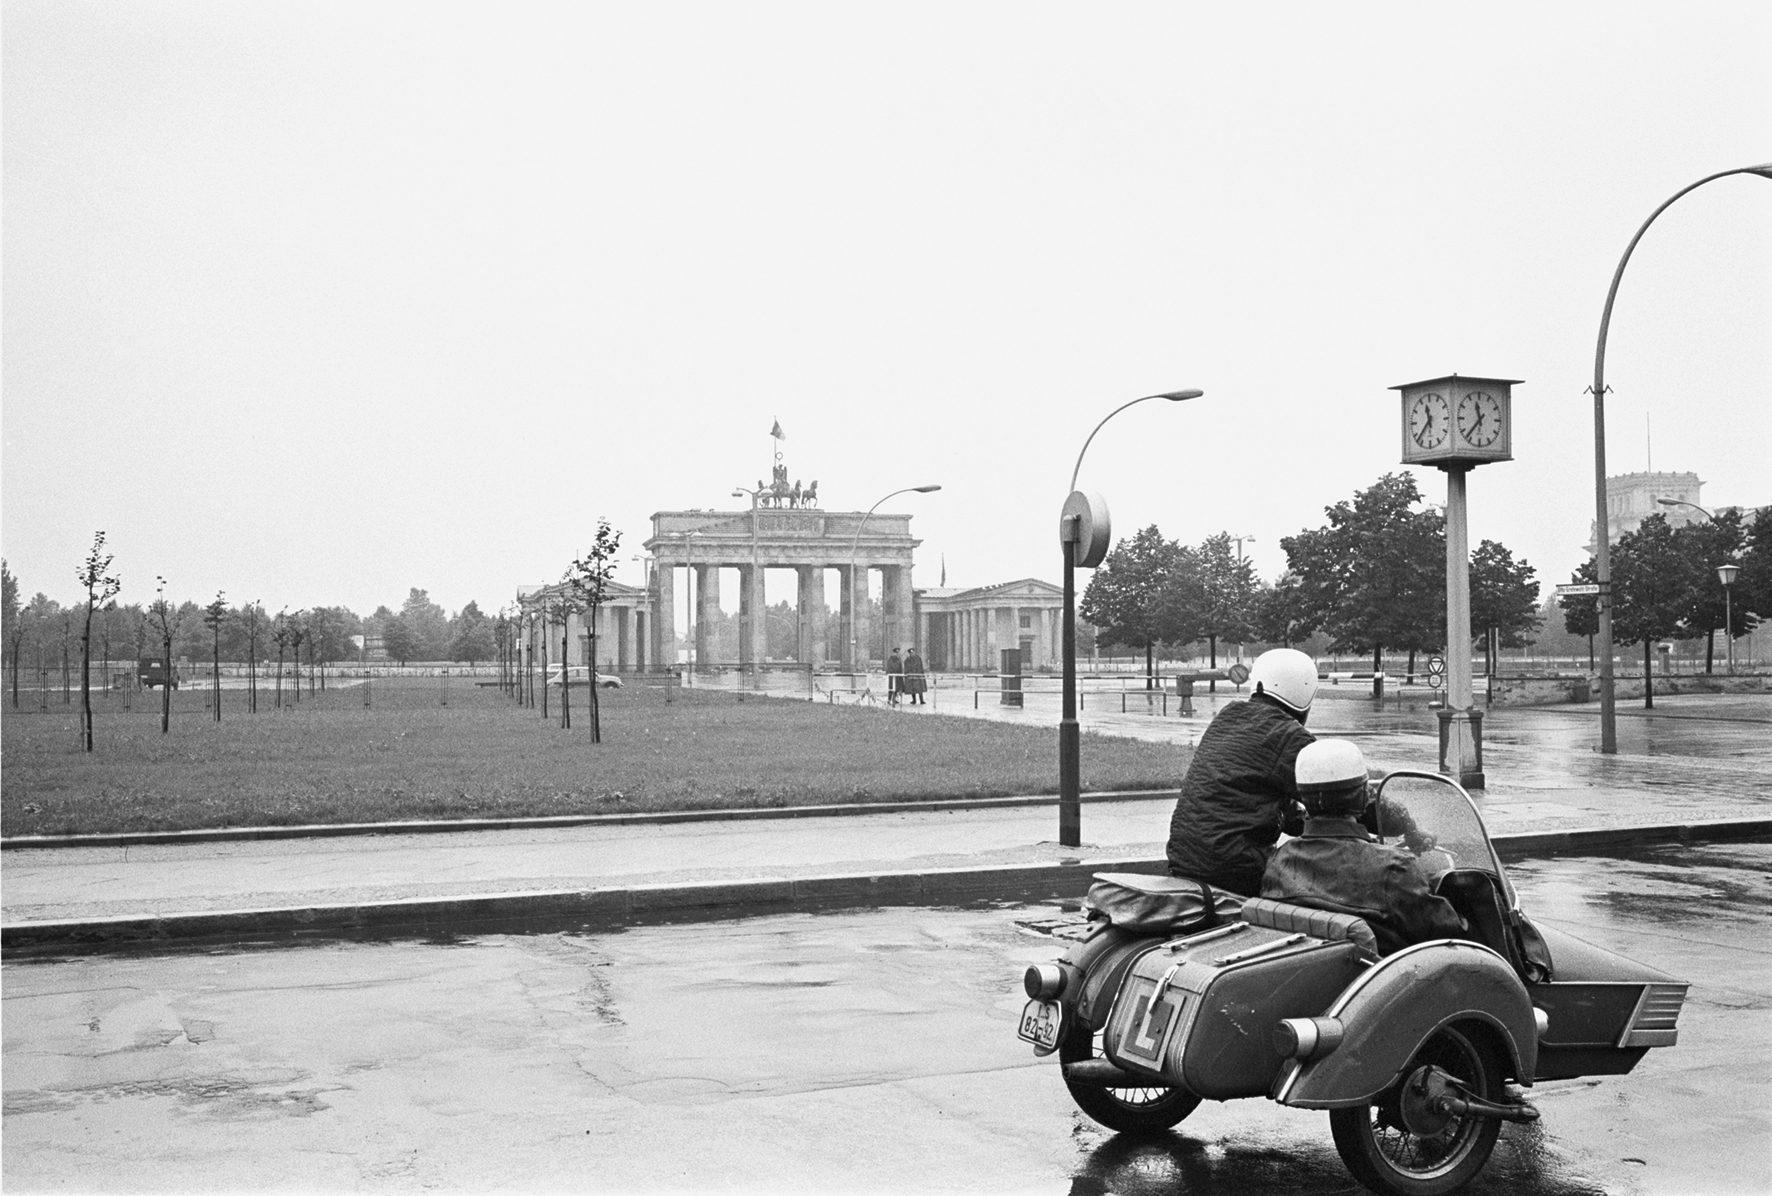 Johannes Haile, Berlin, 1962. Photo. Courtesy of the ifa Gallery Berlin/Stuttgart